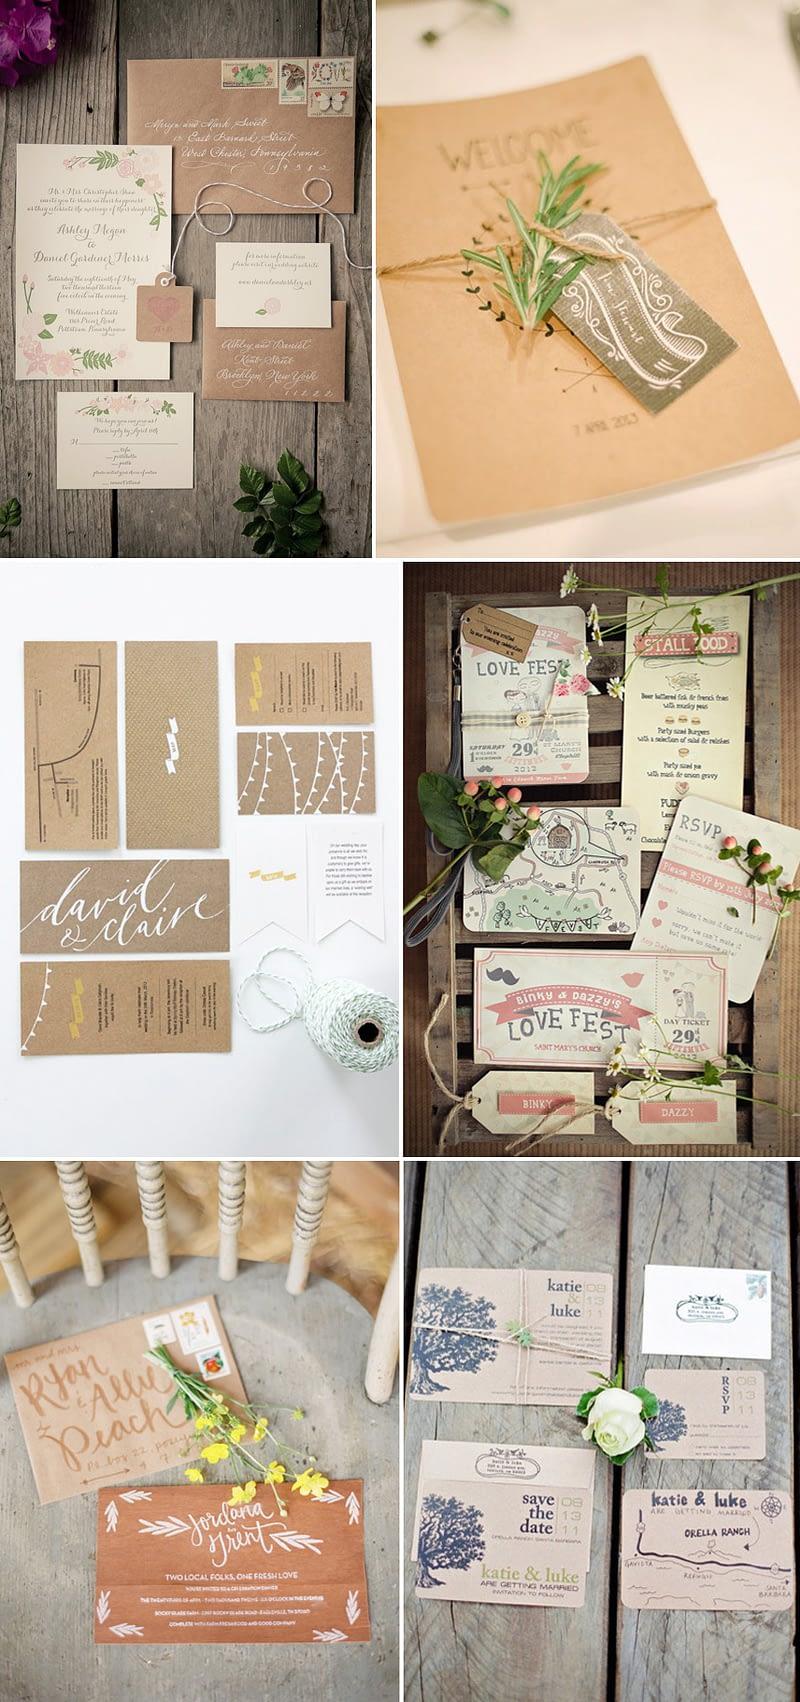 Coco Wedding Venues - Rustic Romance Wedding Style - Stationary.